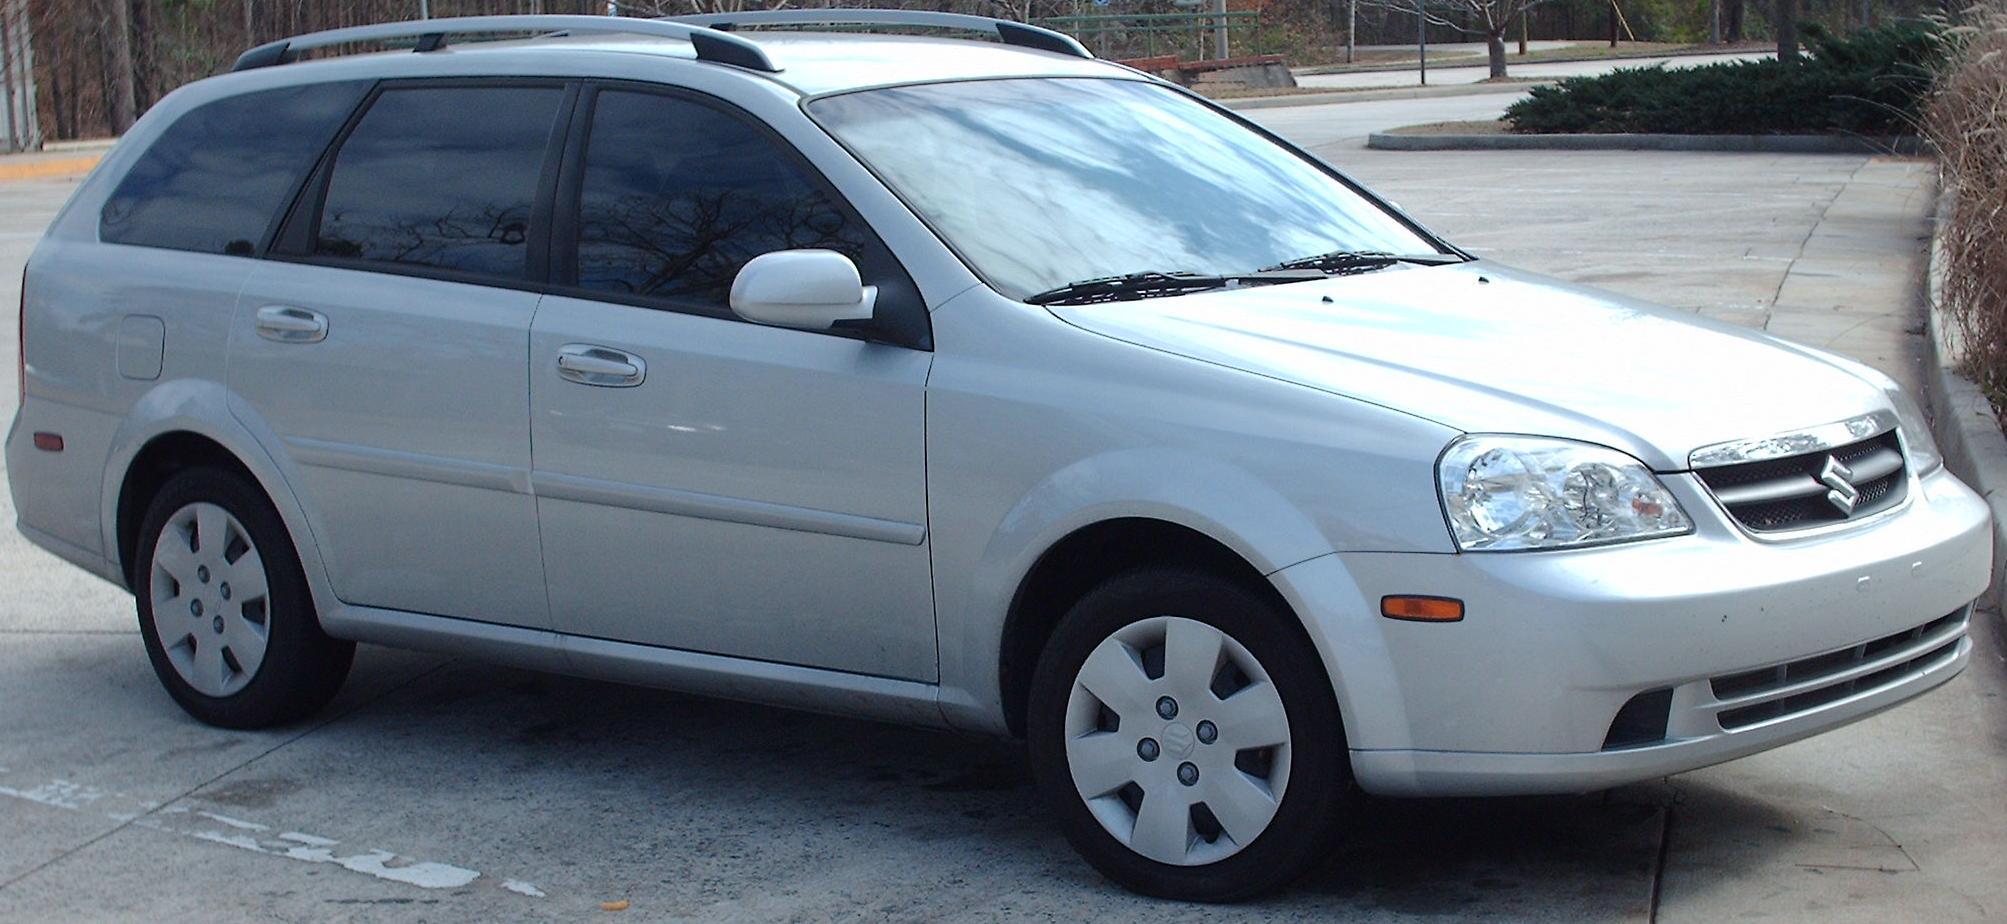 Suzuki I Forenza